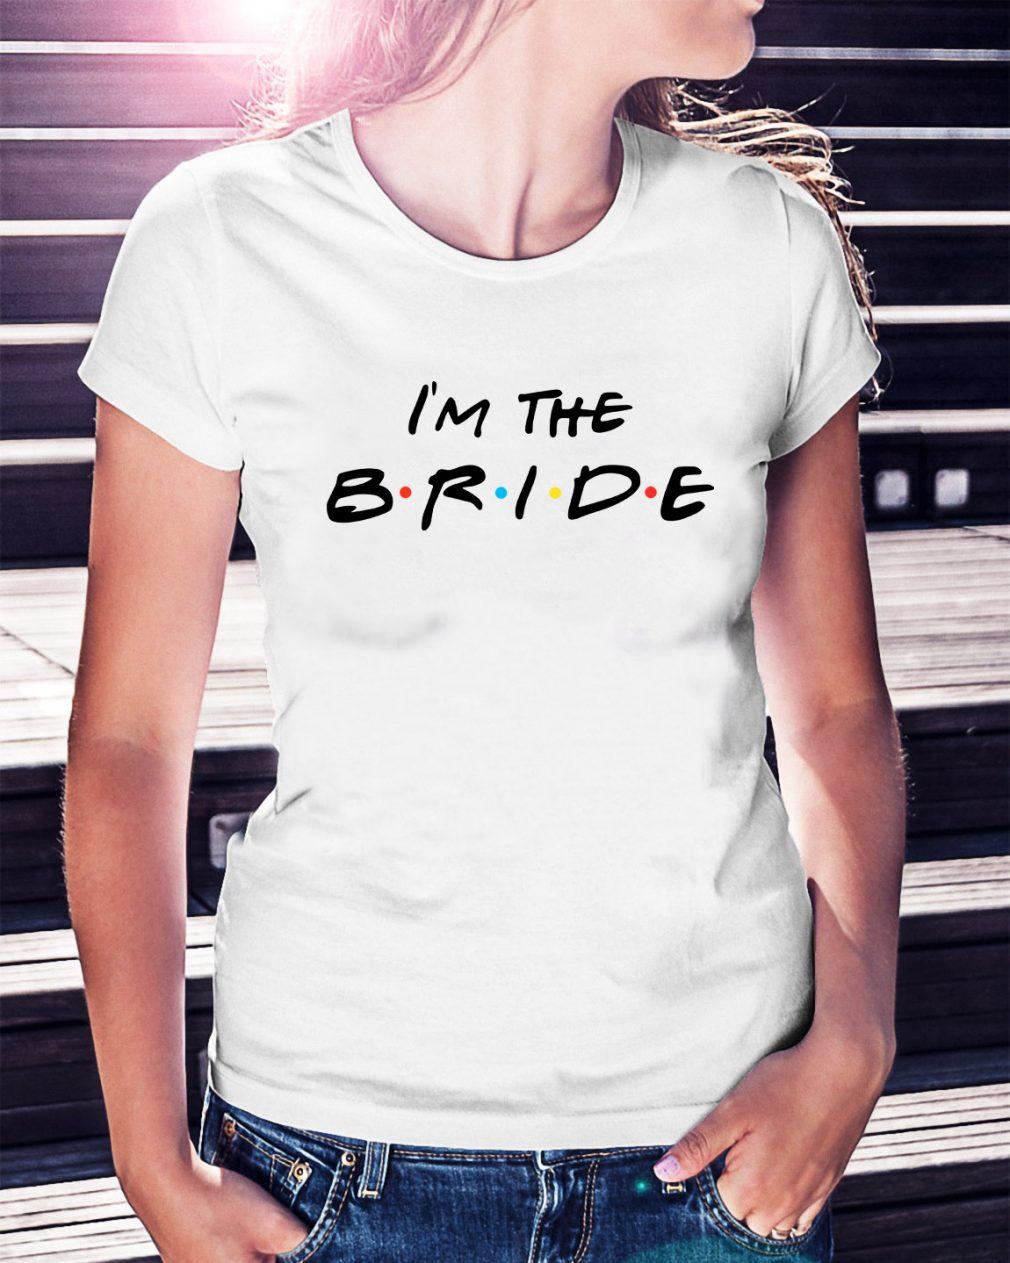 I'm the Bride Ladies Tee